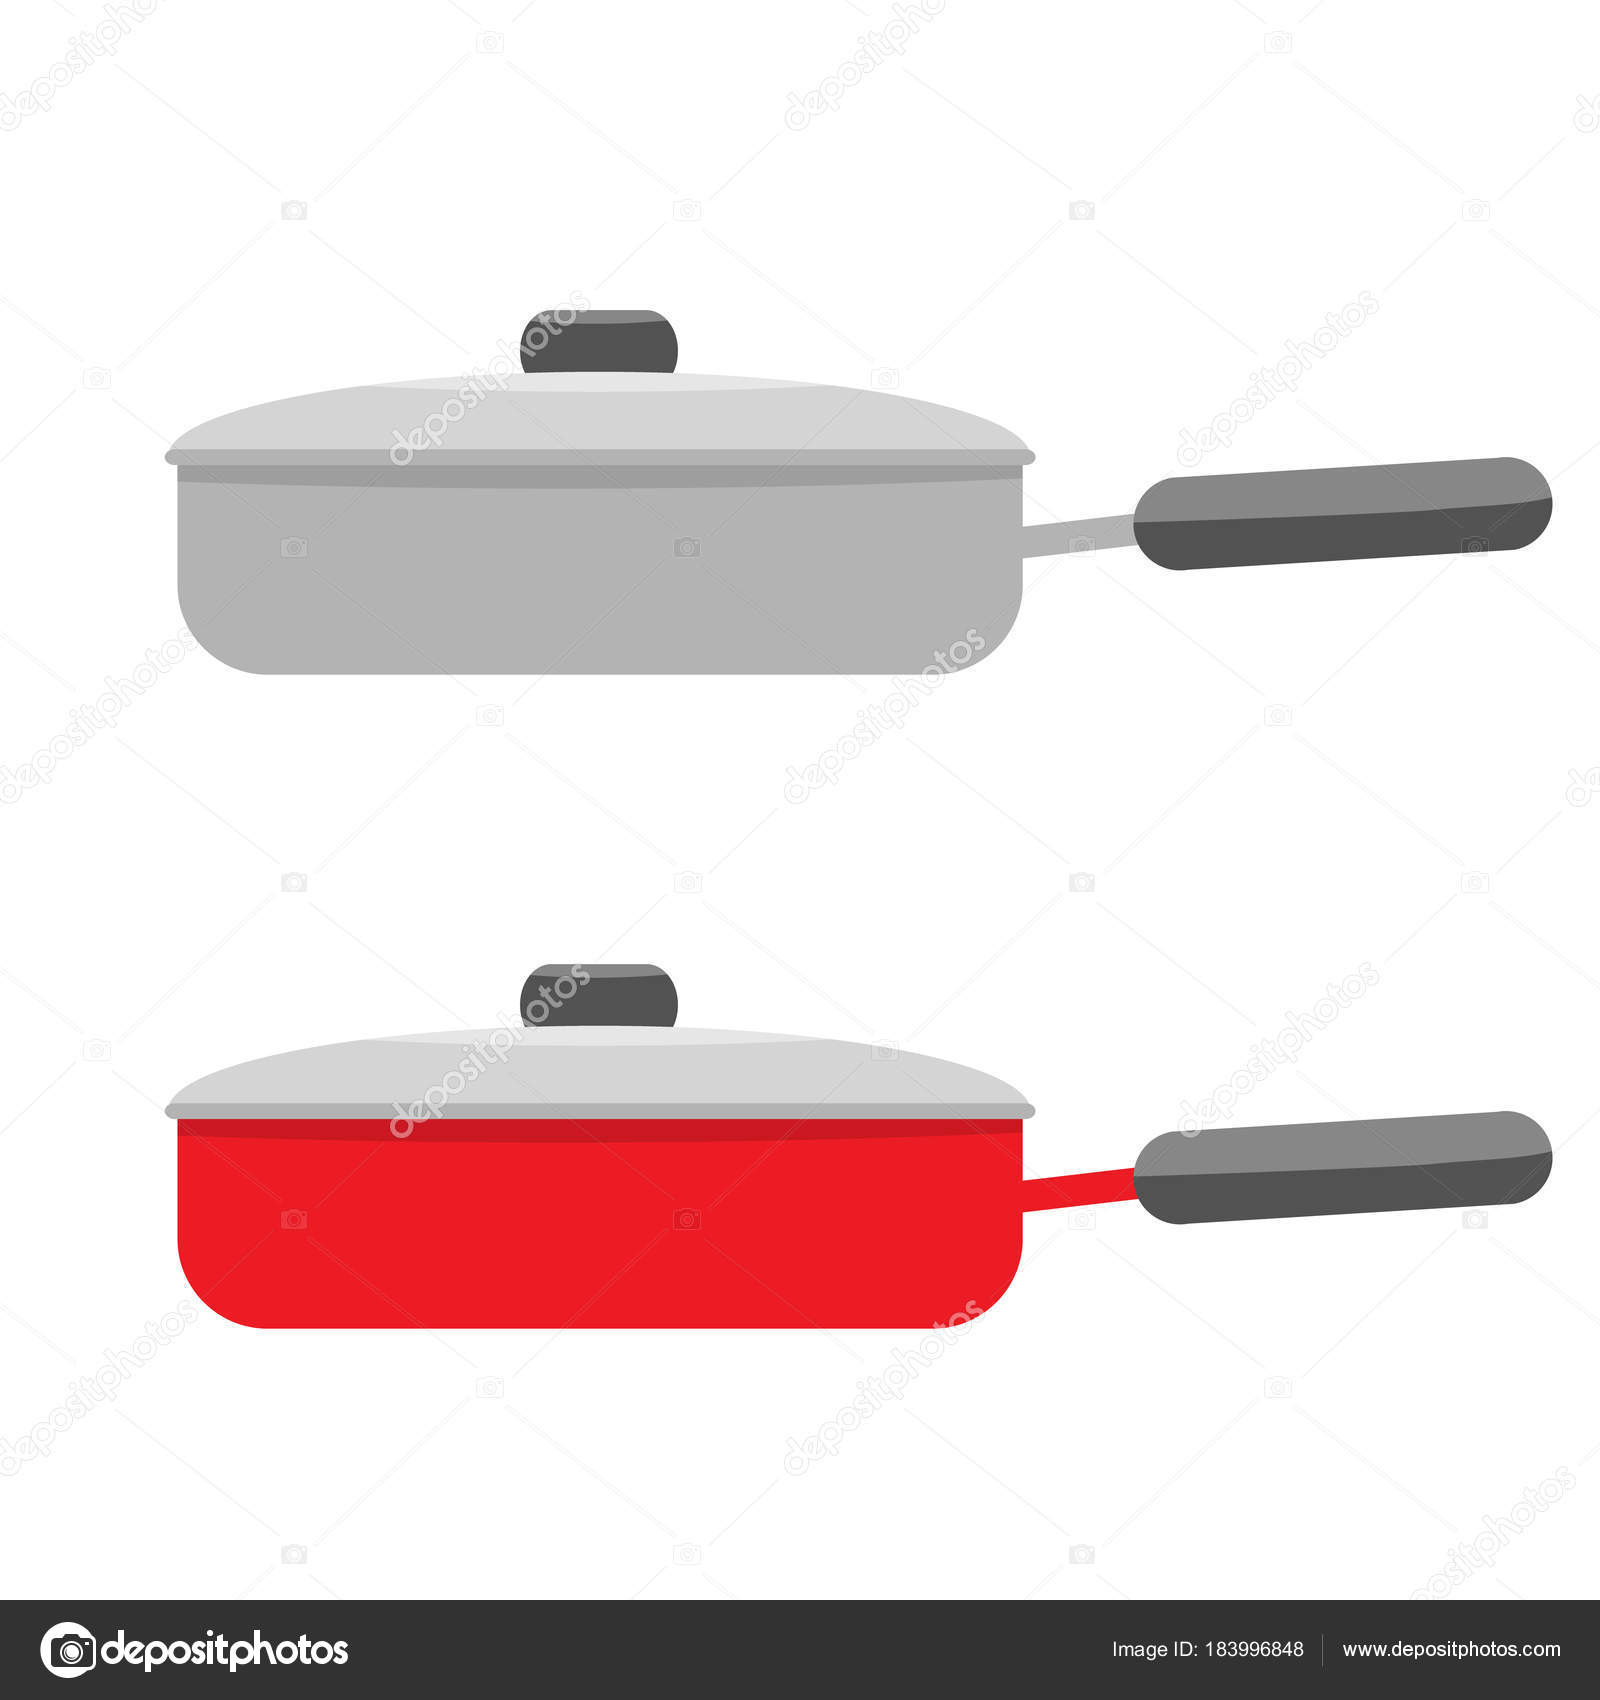 home kitchen equipment restain cabinets 平底锅煮钢家用厨房设备盖 侧面视图 图库矢量图像 c zeynurbabayev 图库矢量图片